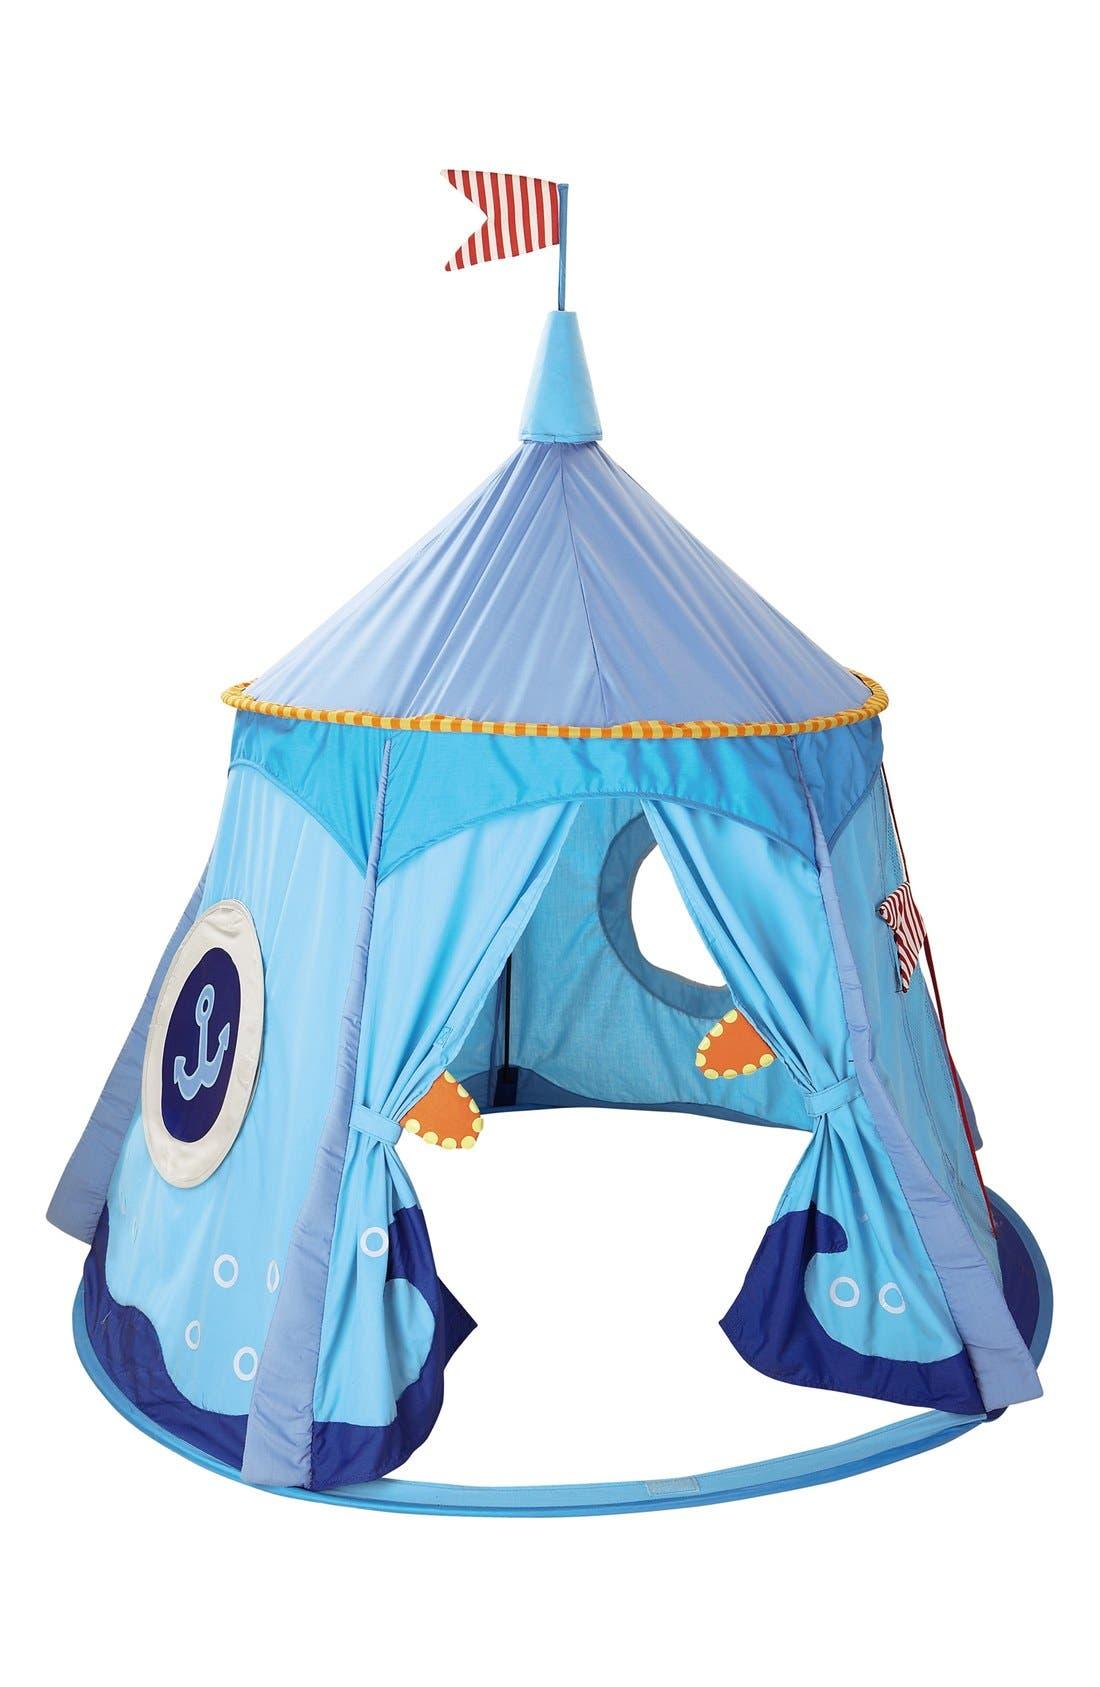 HABA 'Pirate's Treasure' Play Tent